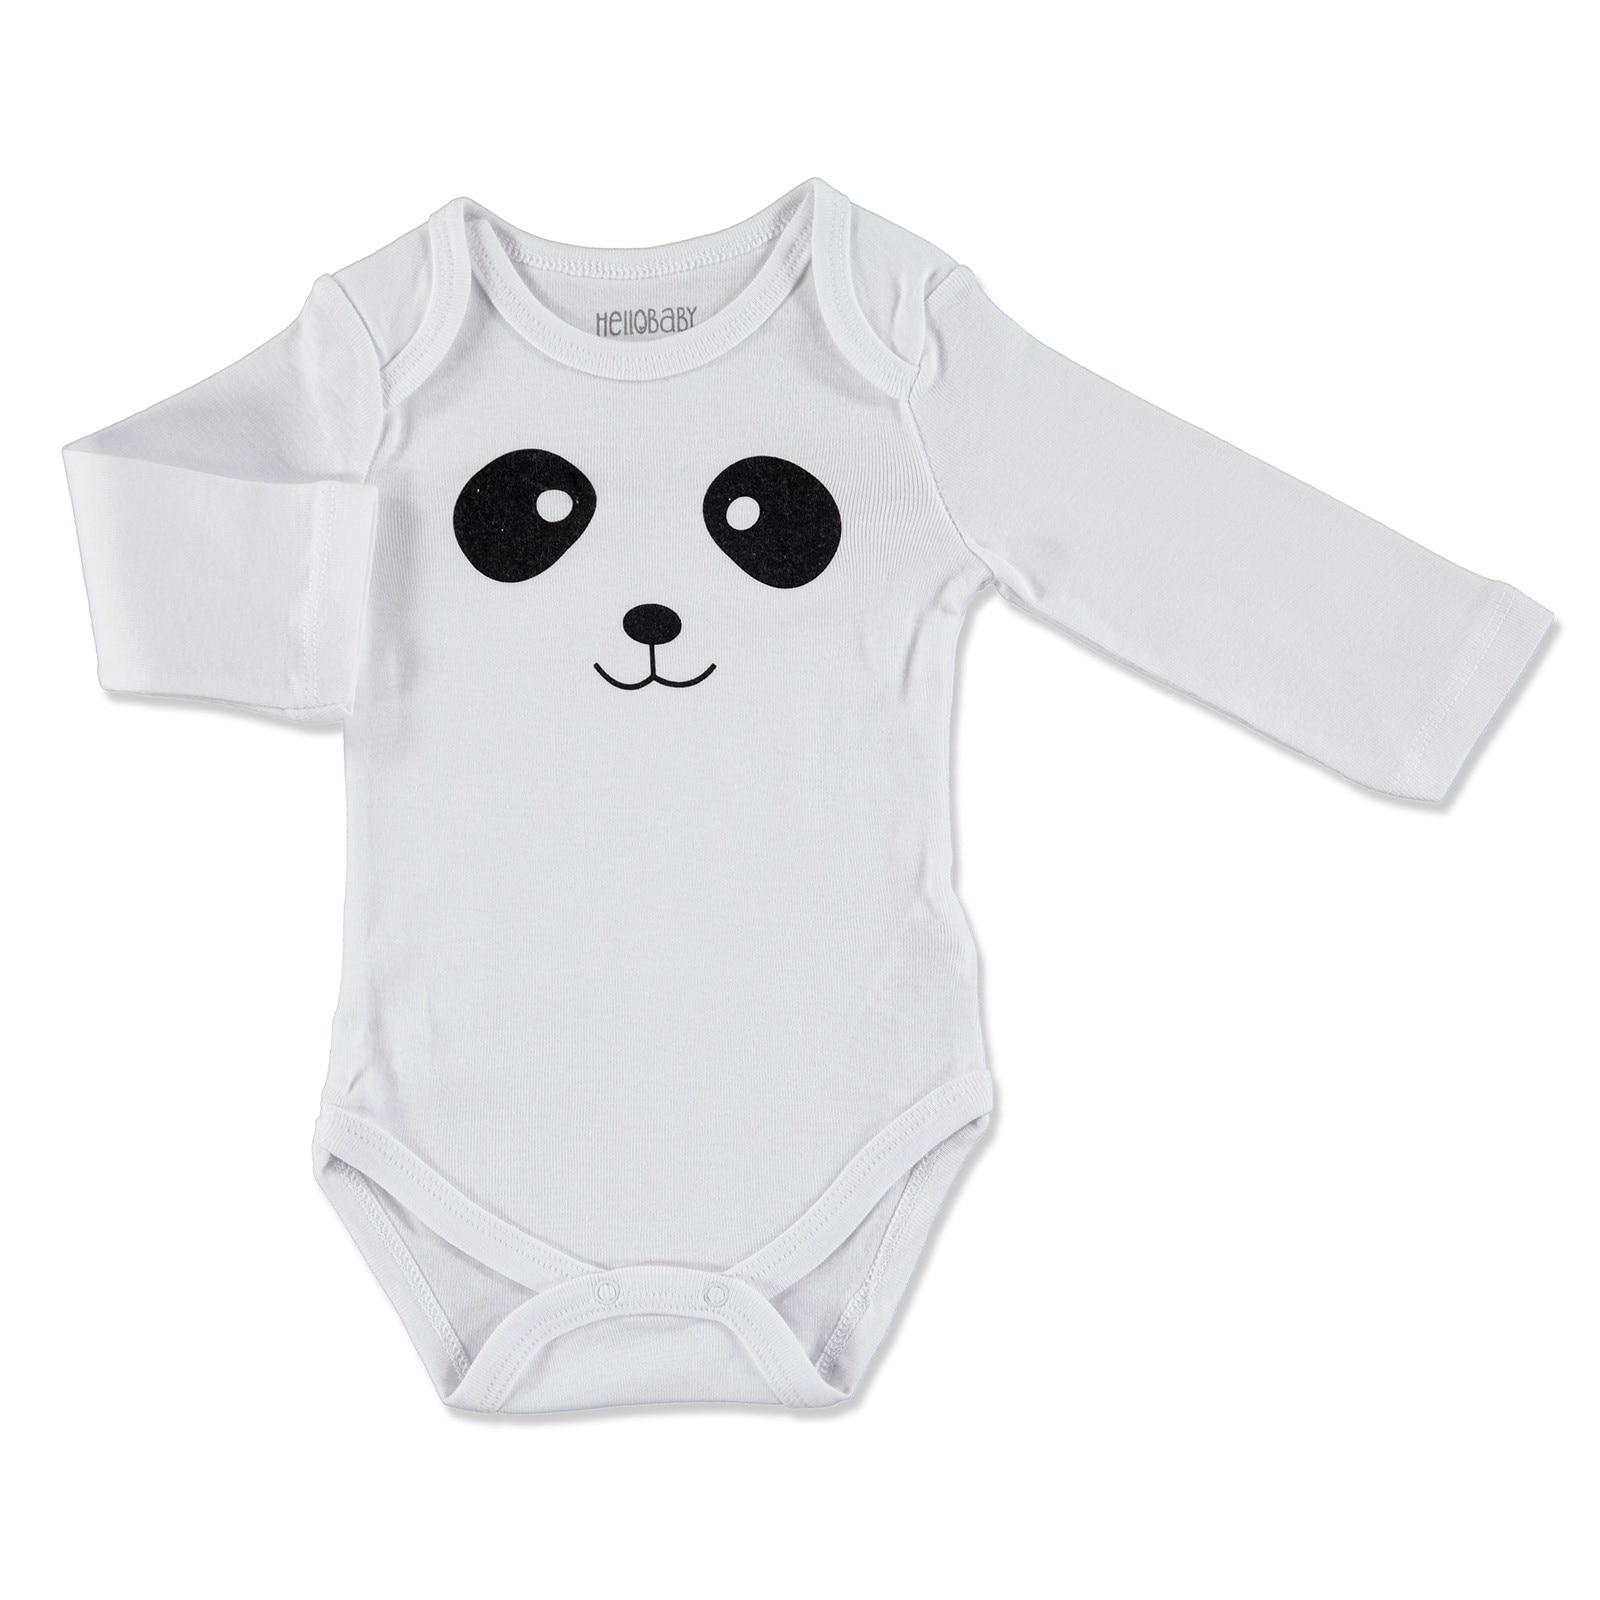 Ebebek HelloBaby Little Animals Face Printed Baby Long Sleeve Bodysuit